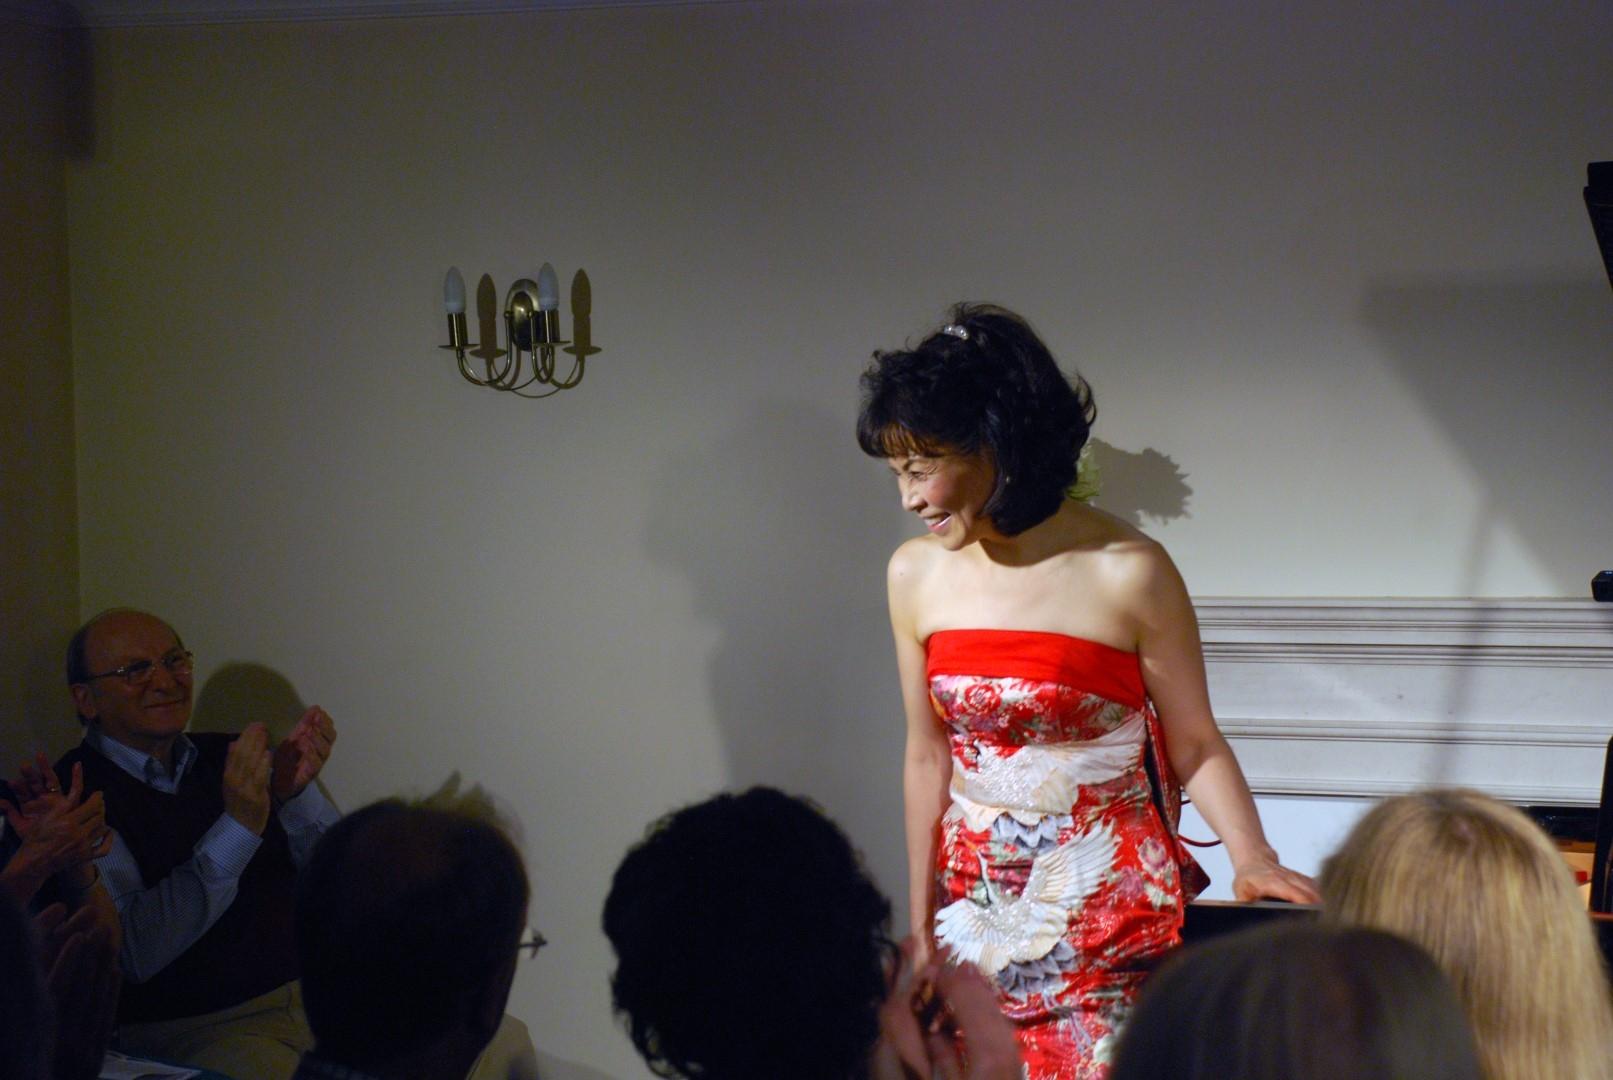 Noriko Ogawa at Breinton on 1 October 2016